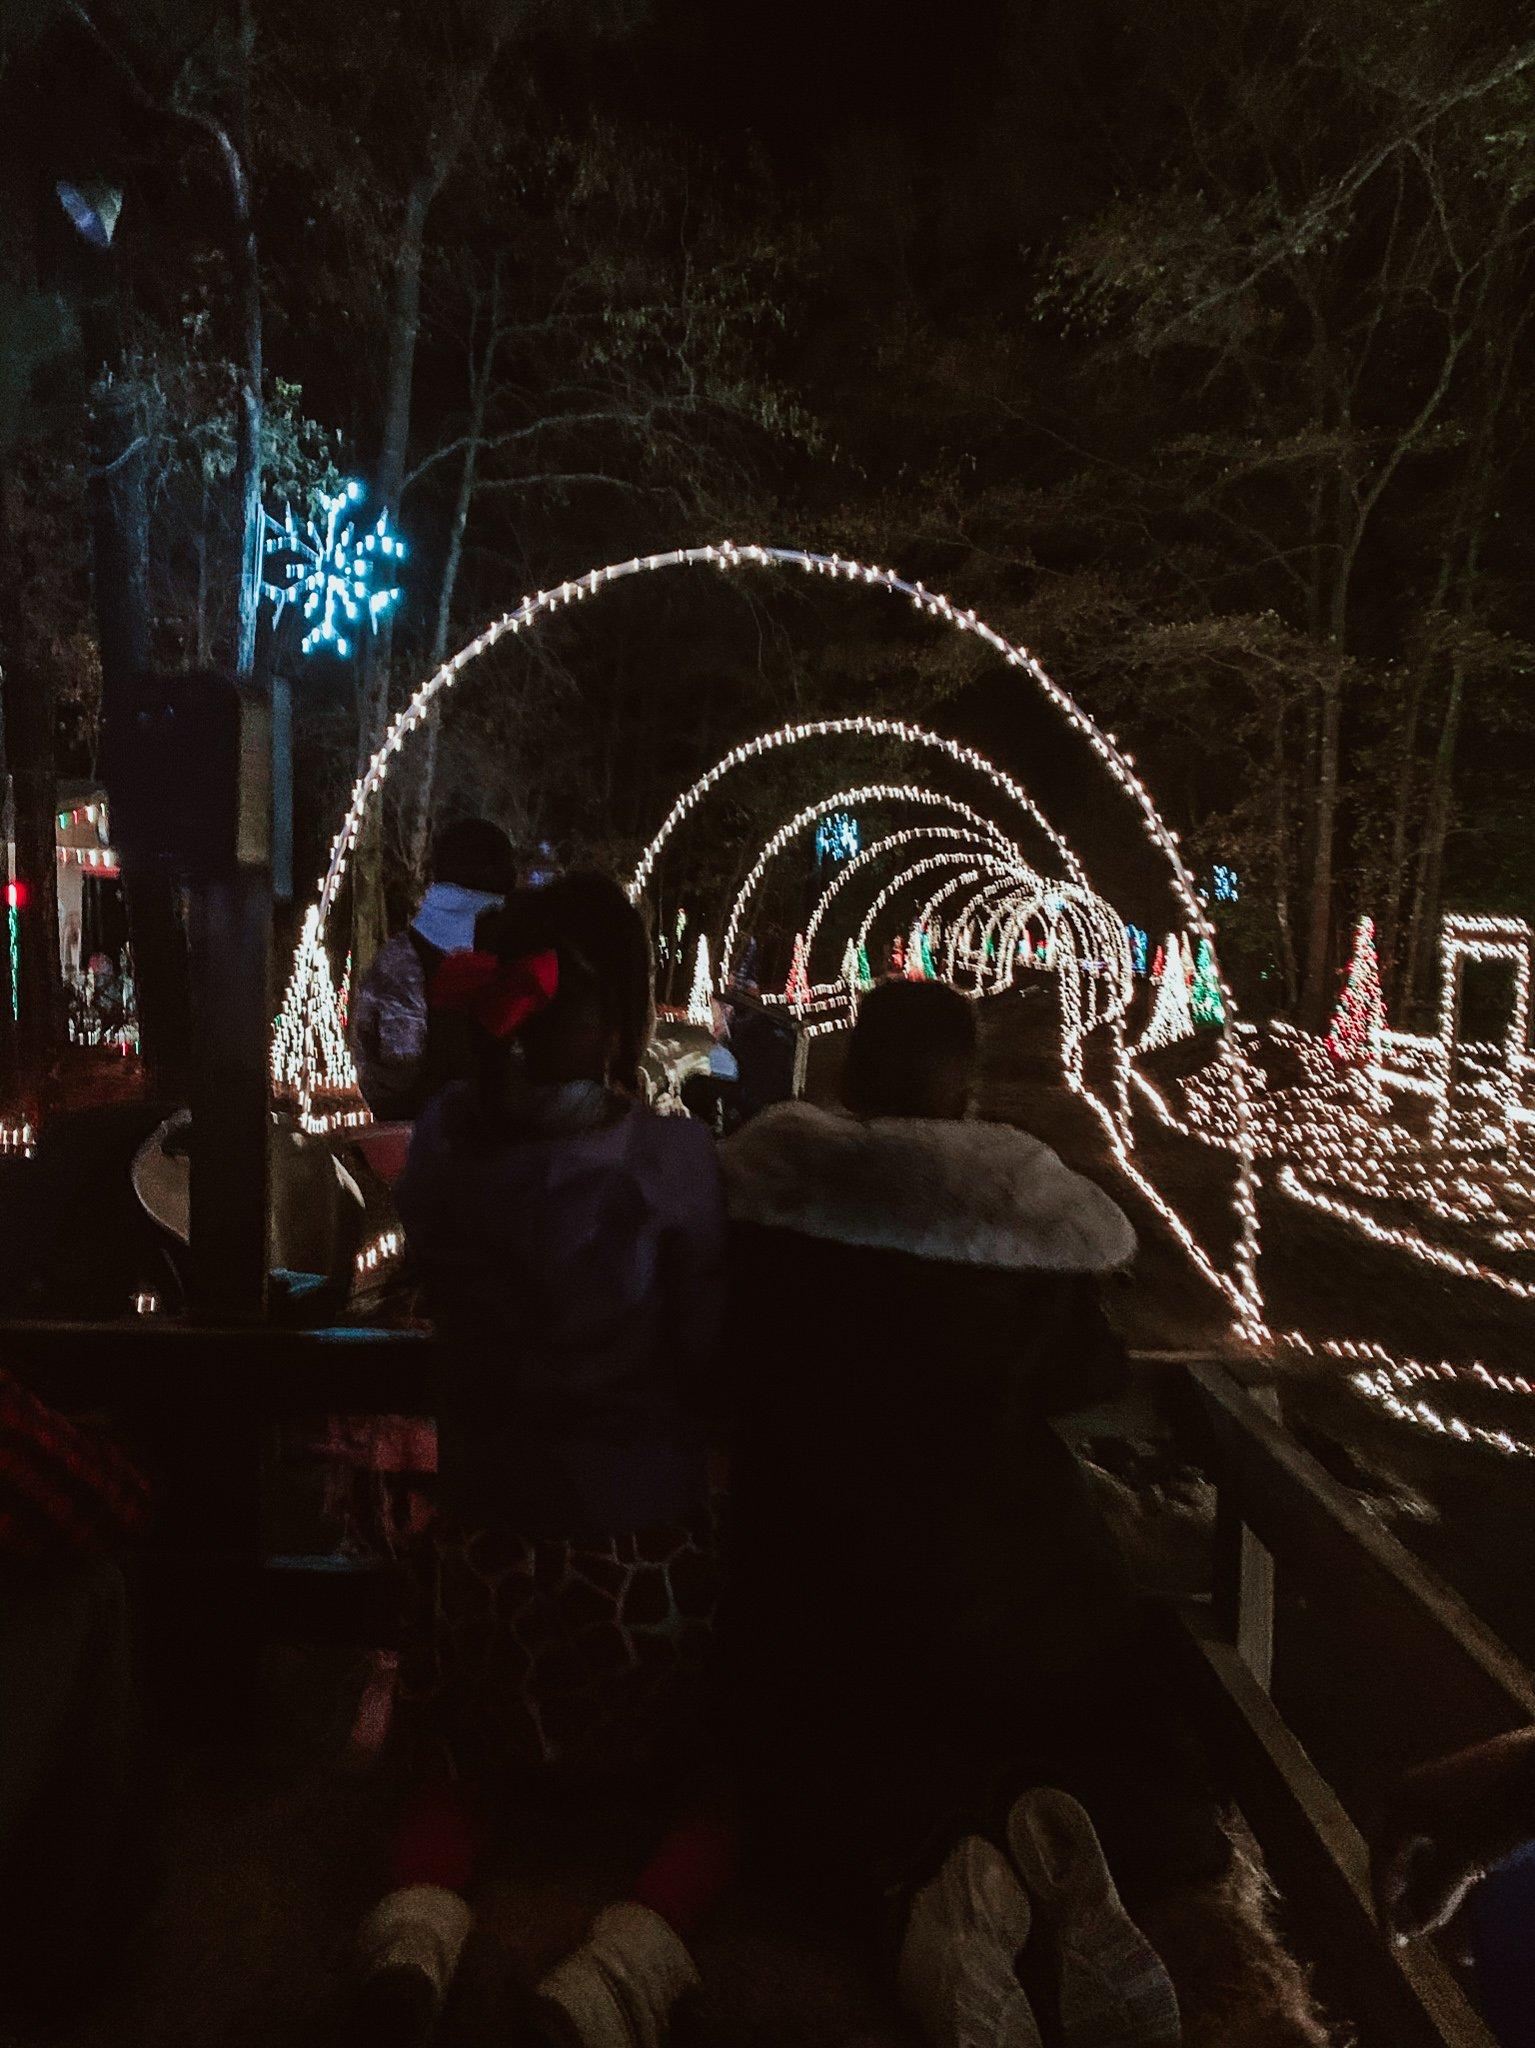 Mike's Farm Christmas Light Show - RCI Plus Topsail